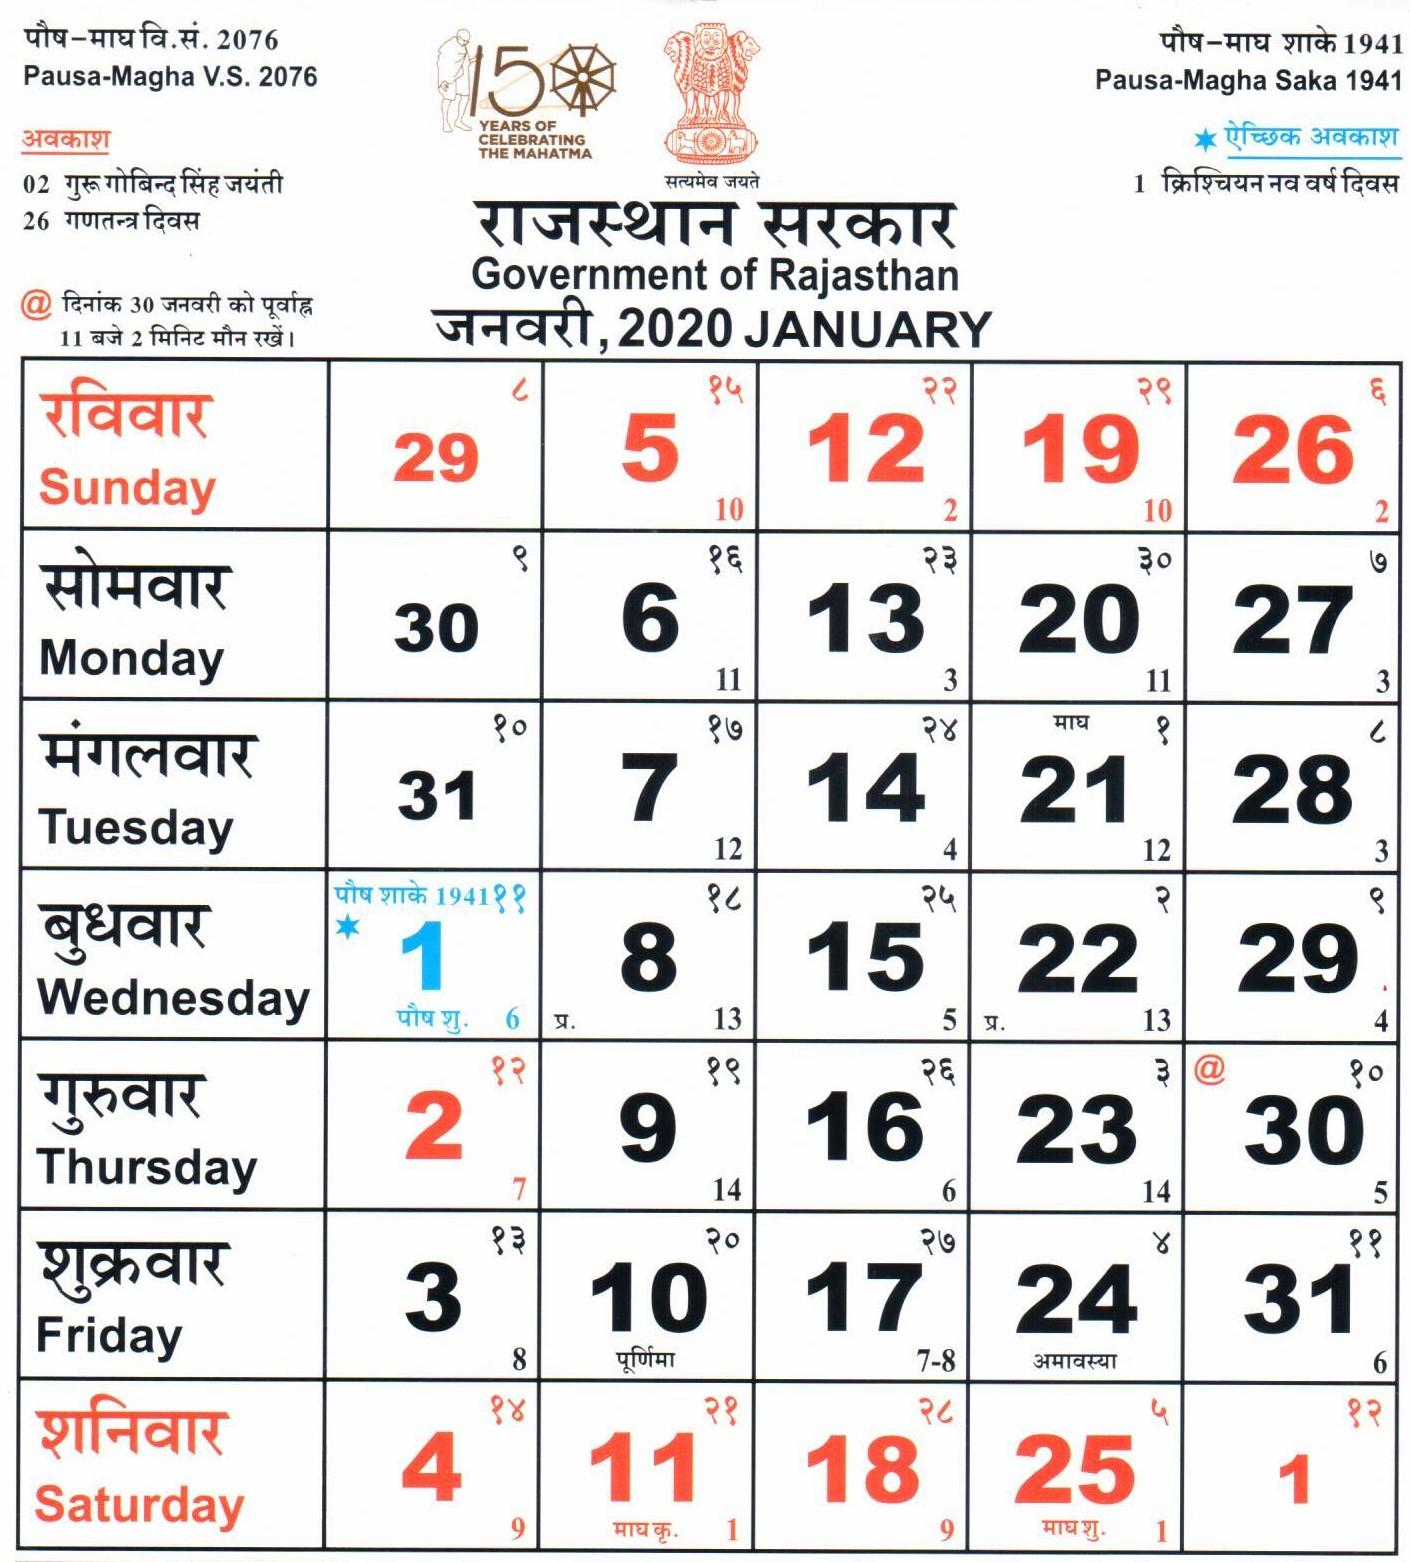 January 2020 Holiday List – Rkalert.in in Bihar Govt. Calendar 2020